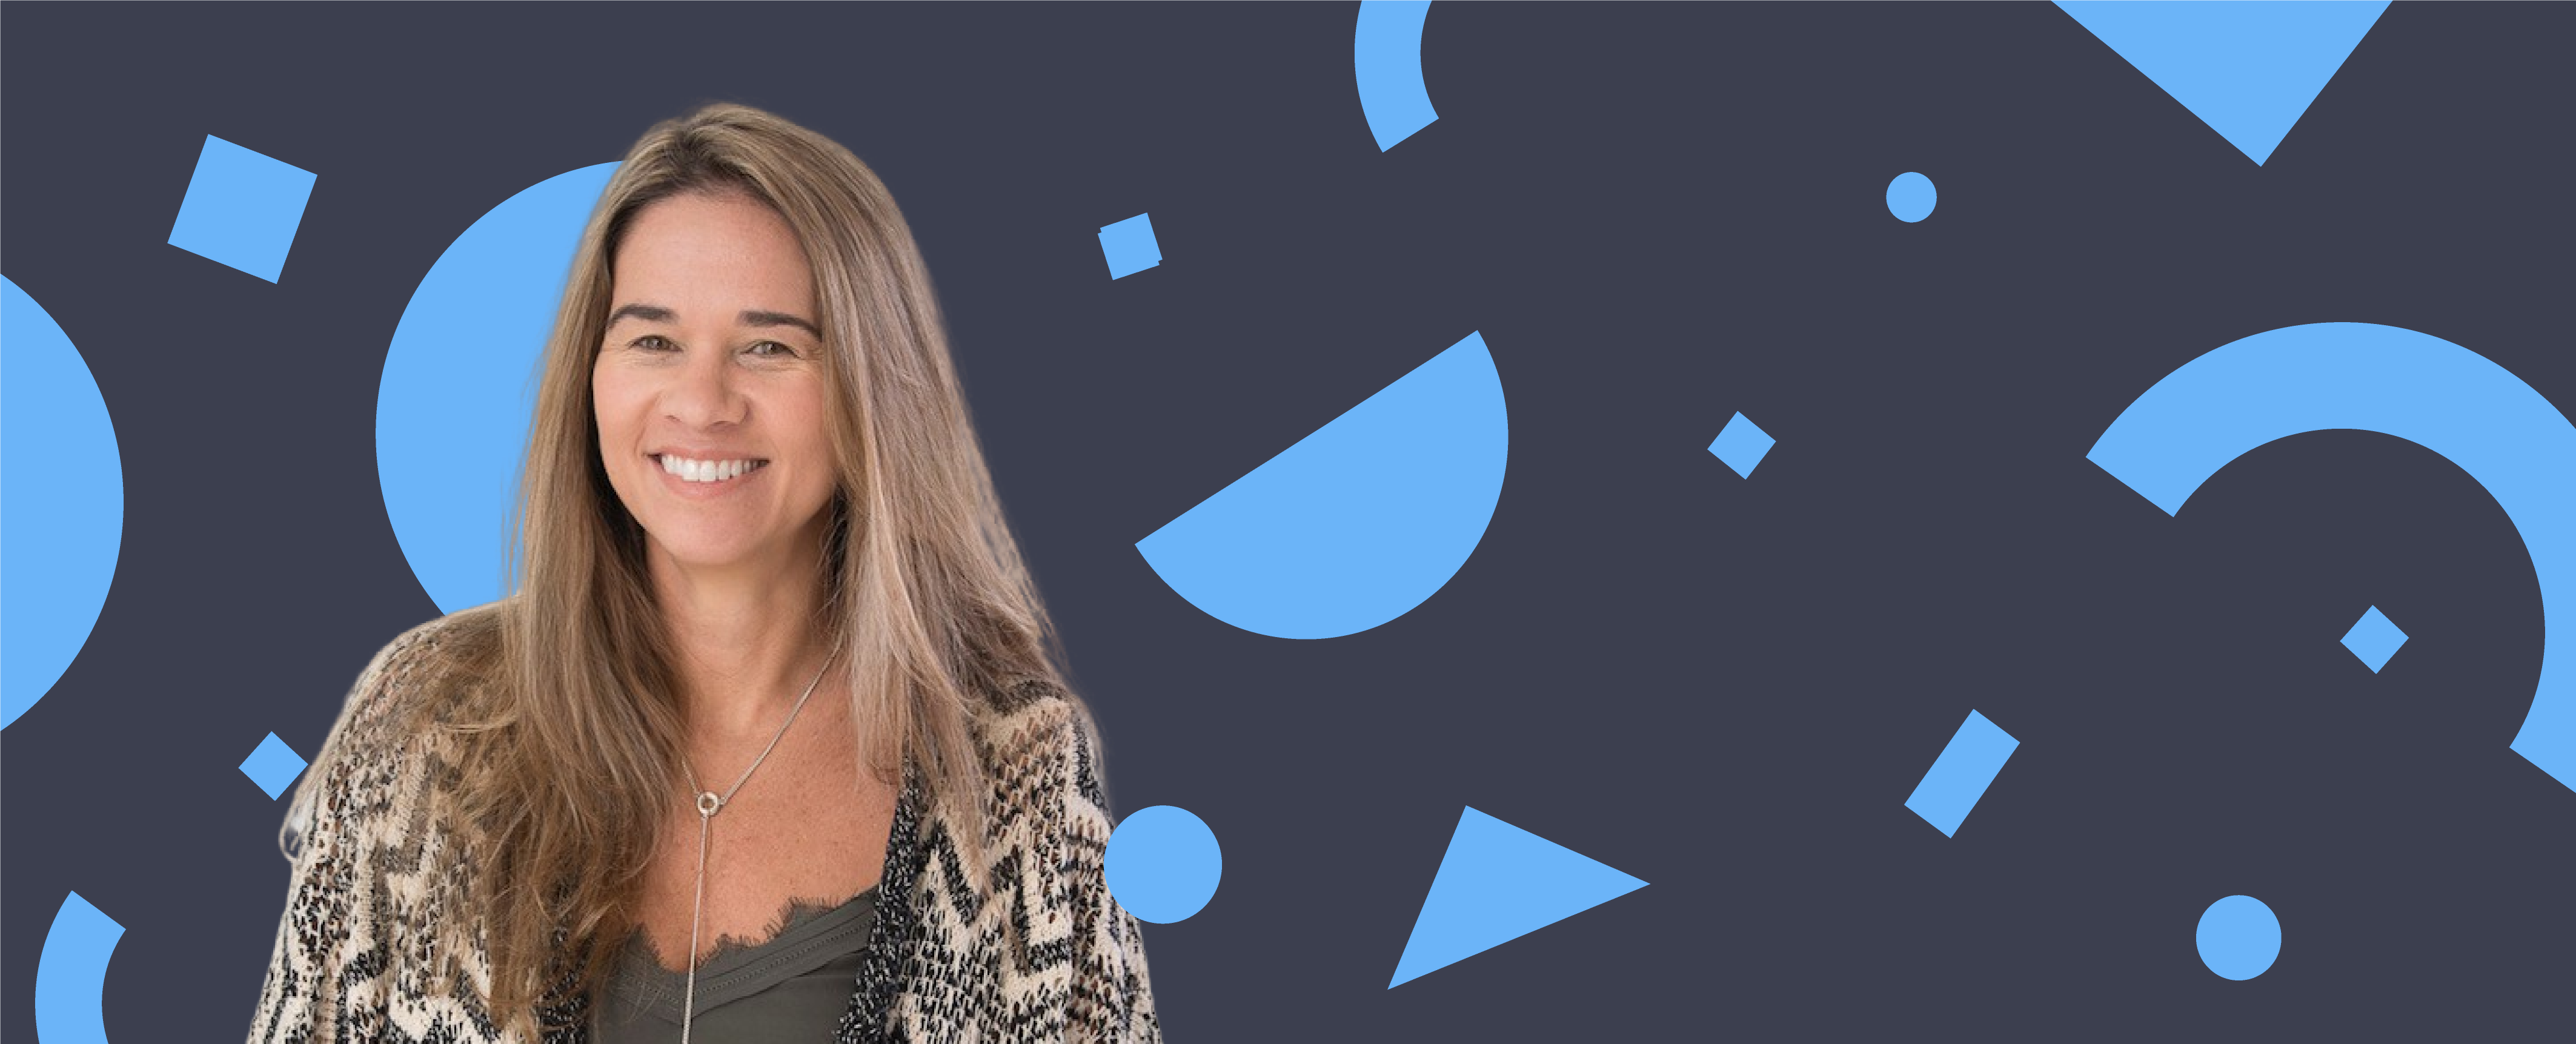 Viviane Gonçalves — on Authenticity, Discipline, and True Consumer Centricity